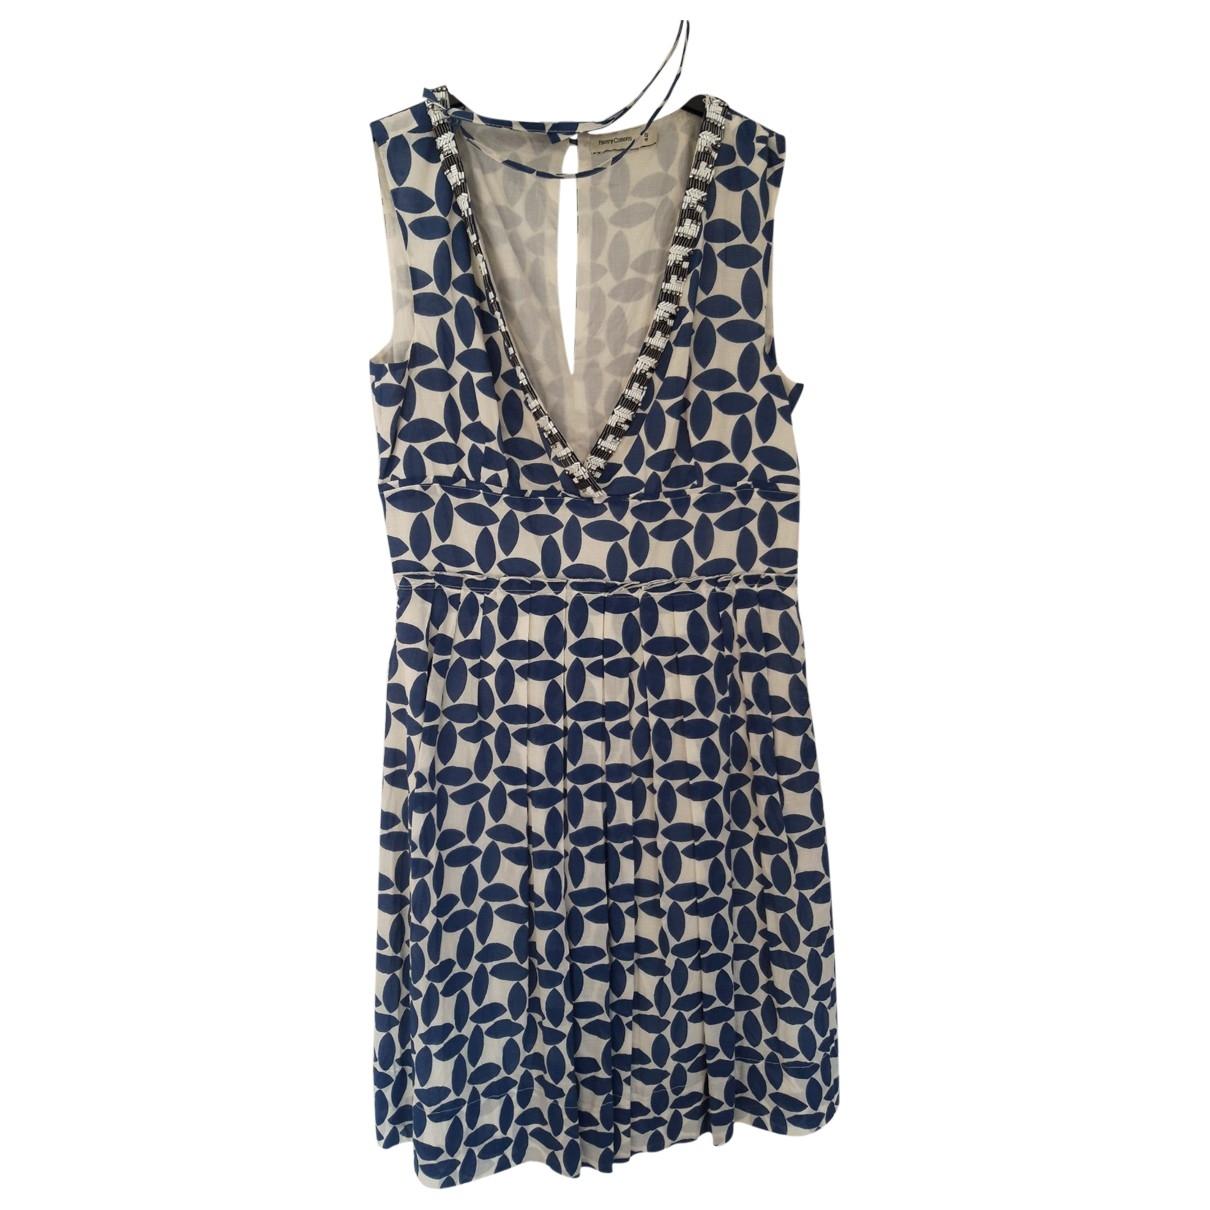 Henry Cotton \N Cotton dress for Women 42 IT